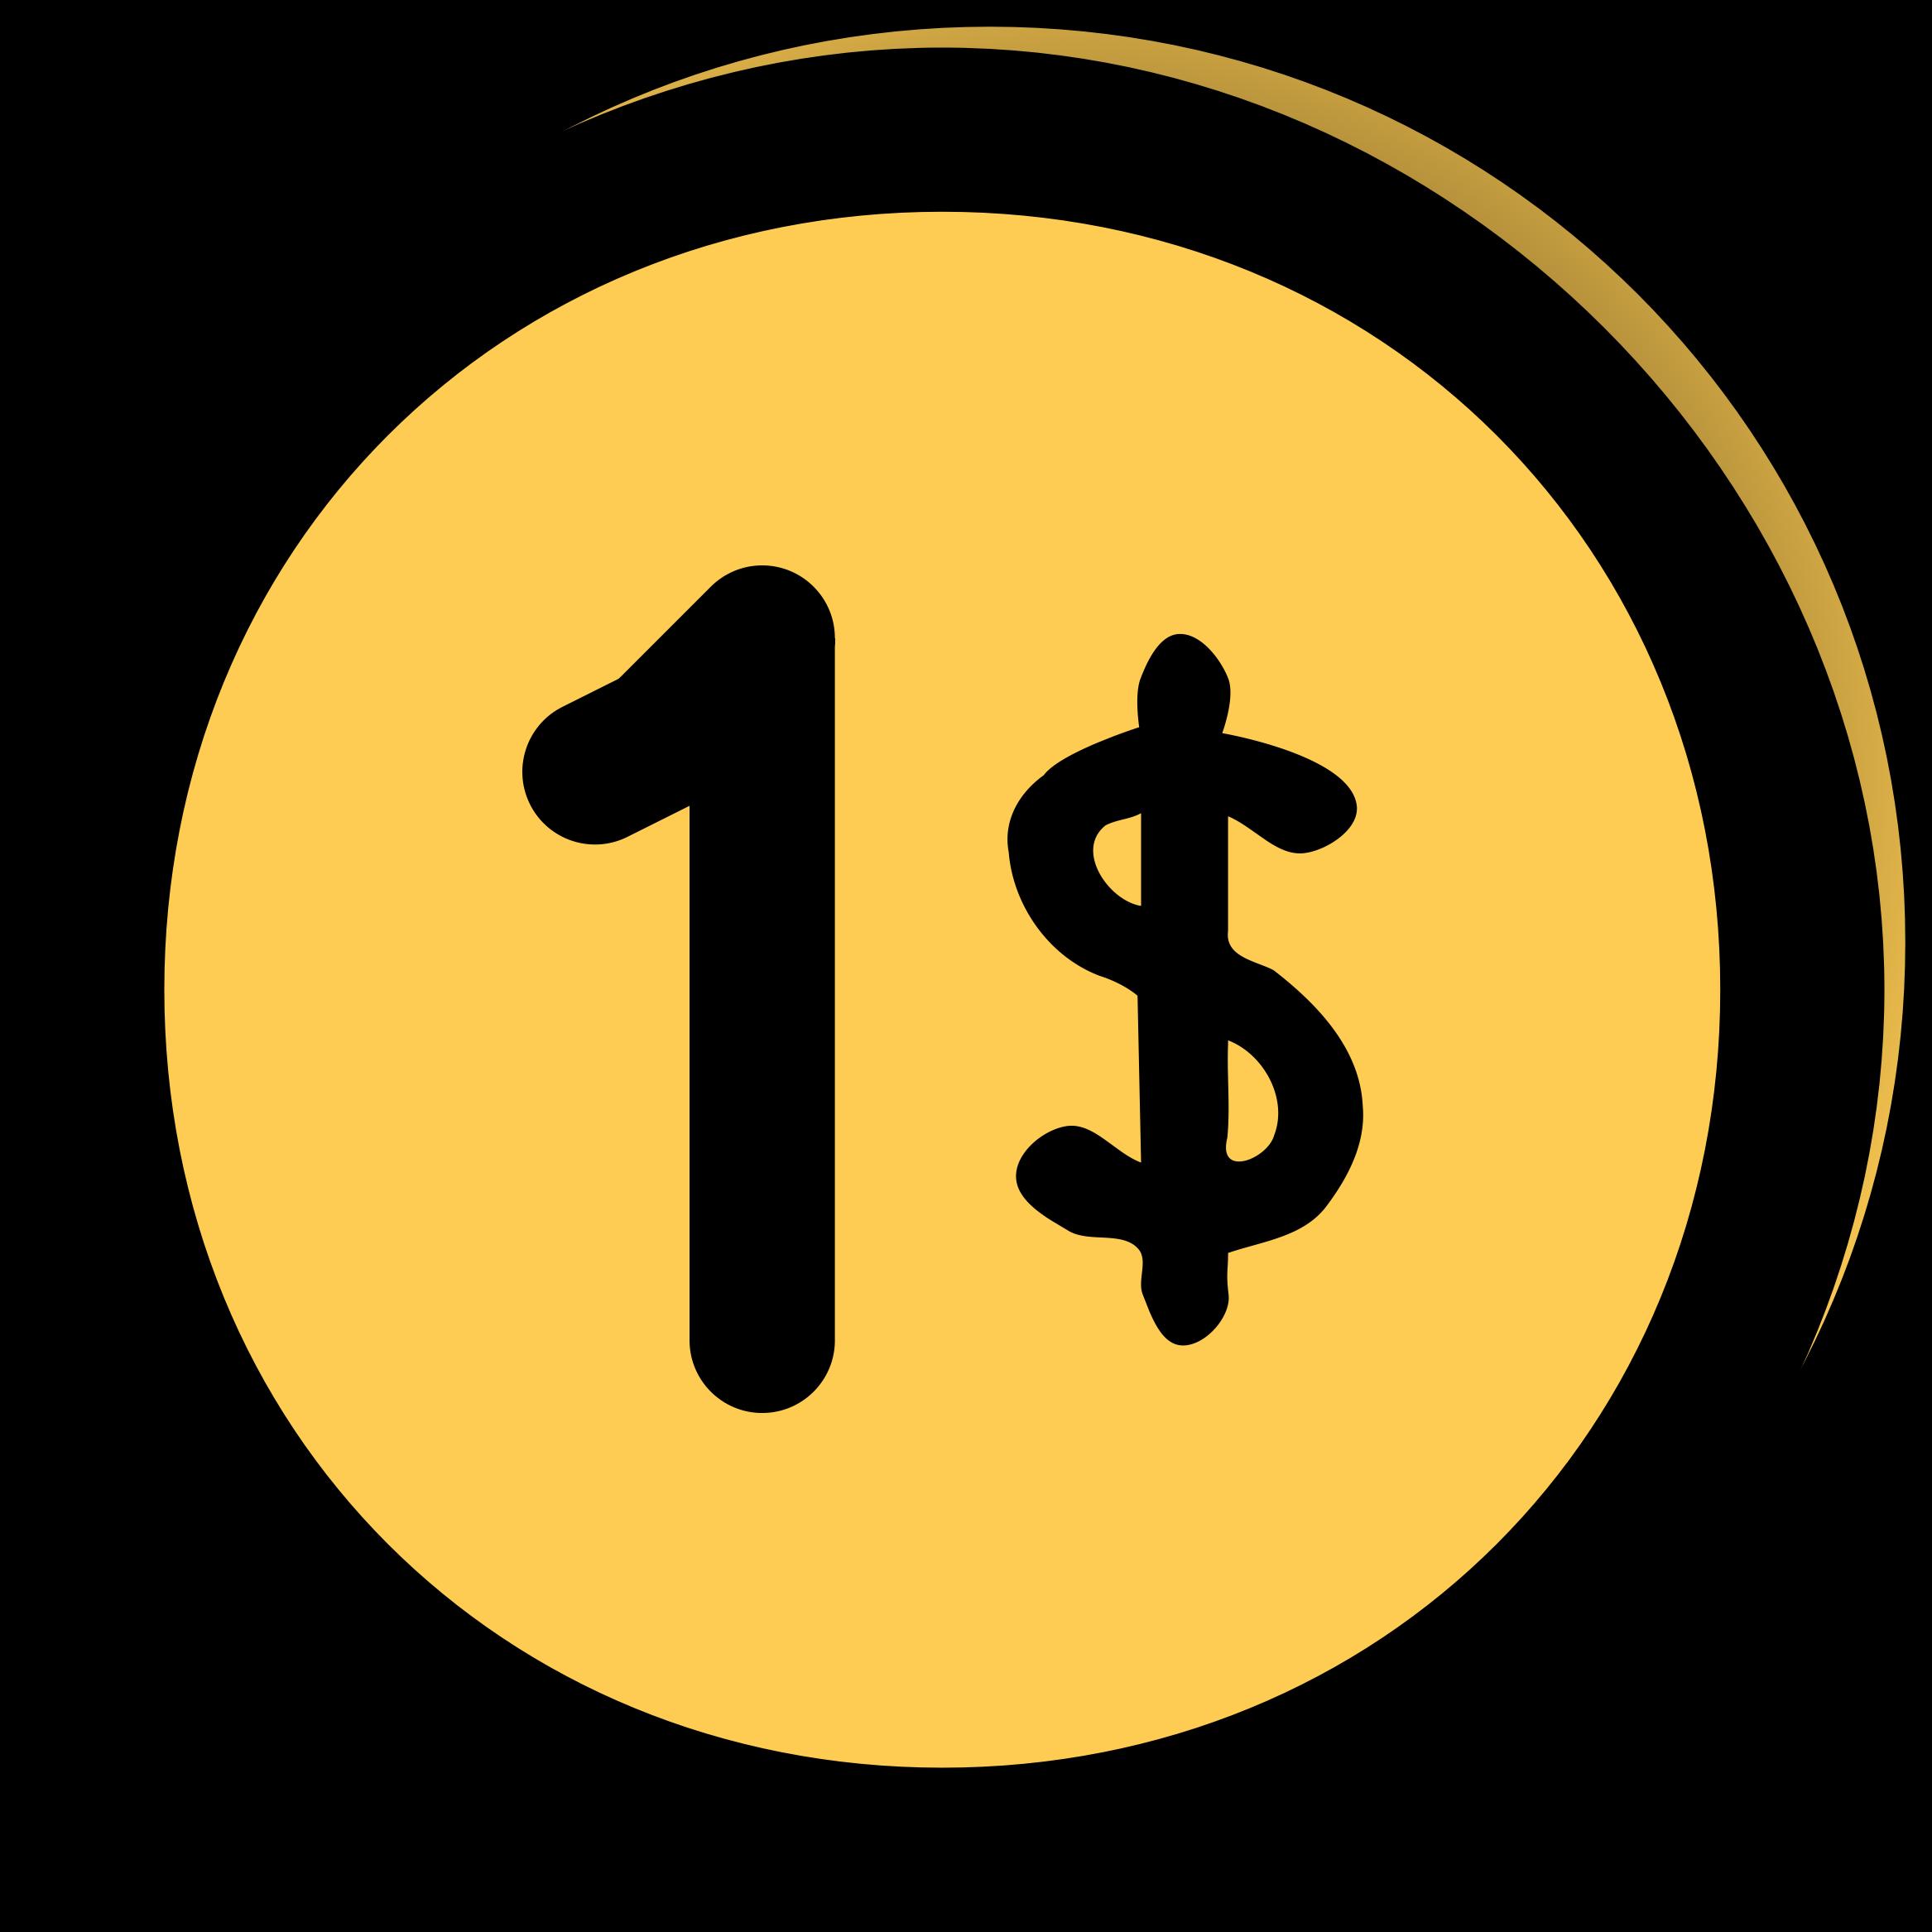 Buck clipart dollar (PNG) Dollar IMAGE Clipart BIG